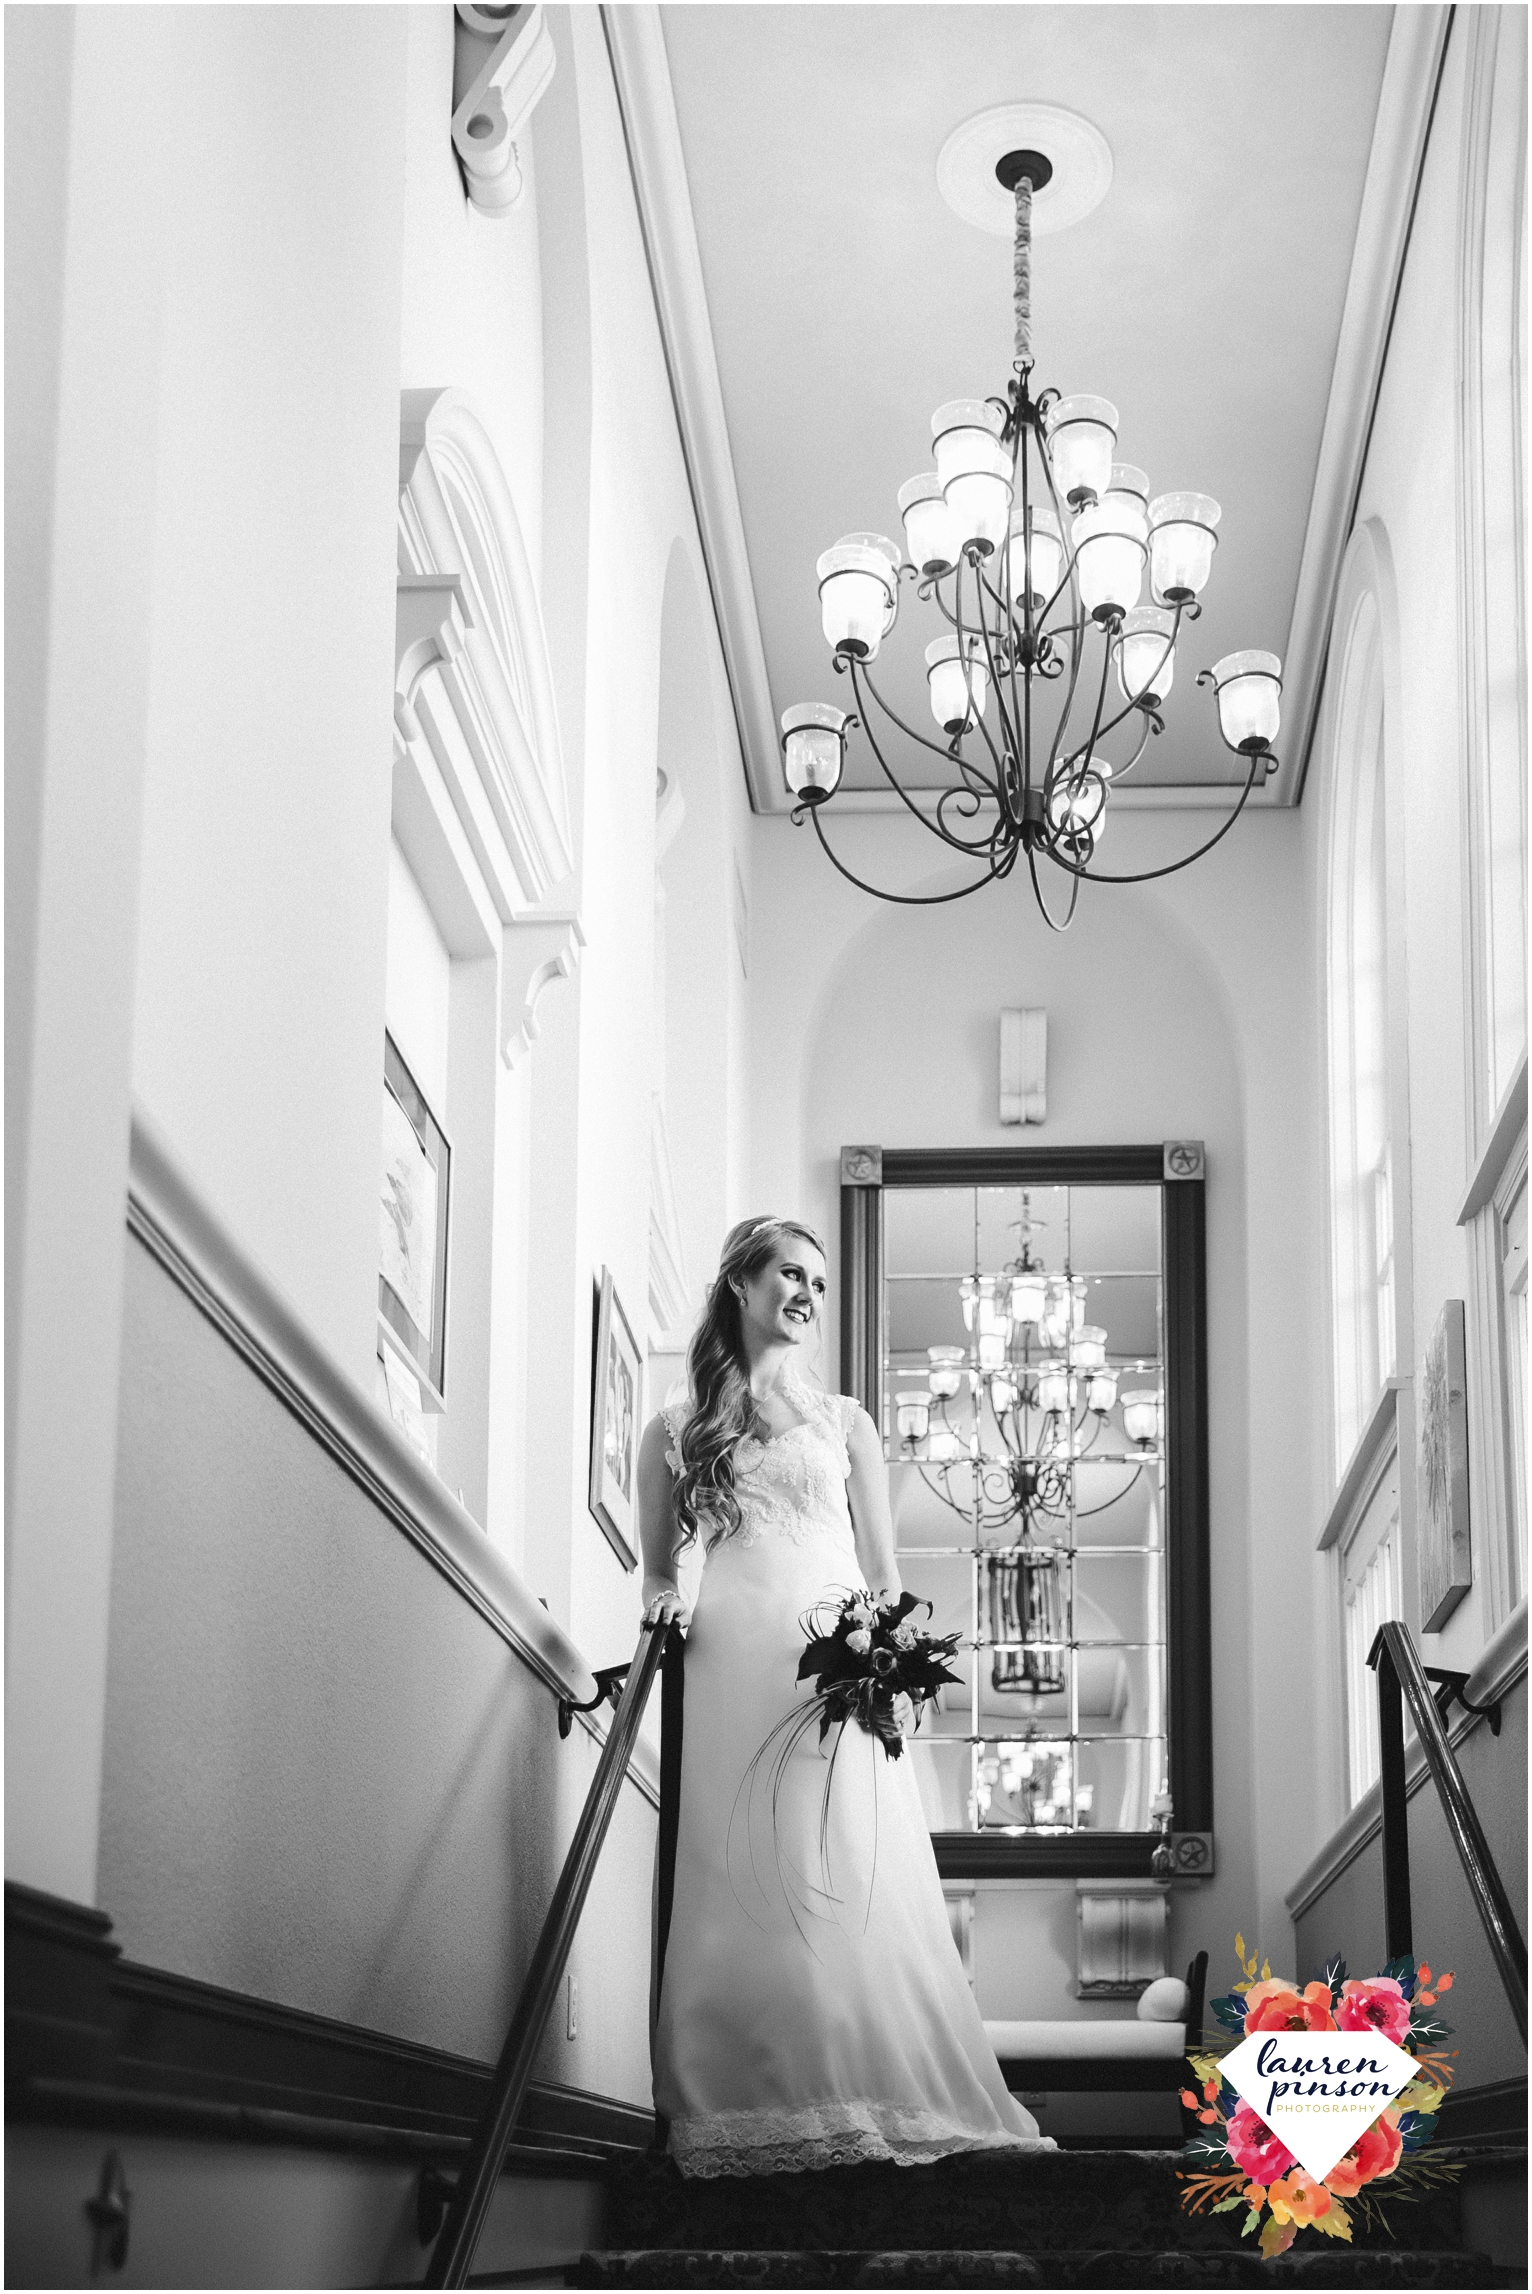 wichita-falls-wedding-photography-at-fain-presbyterian-church-and-the-wellington-timeless-classic-modern-photographer_1216.jpg